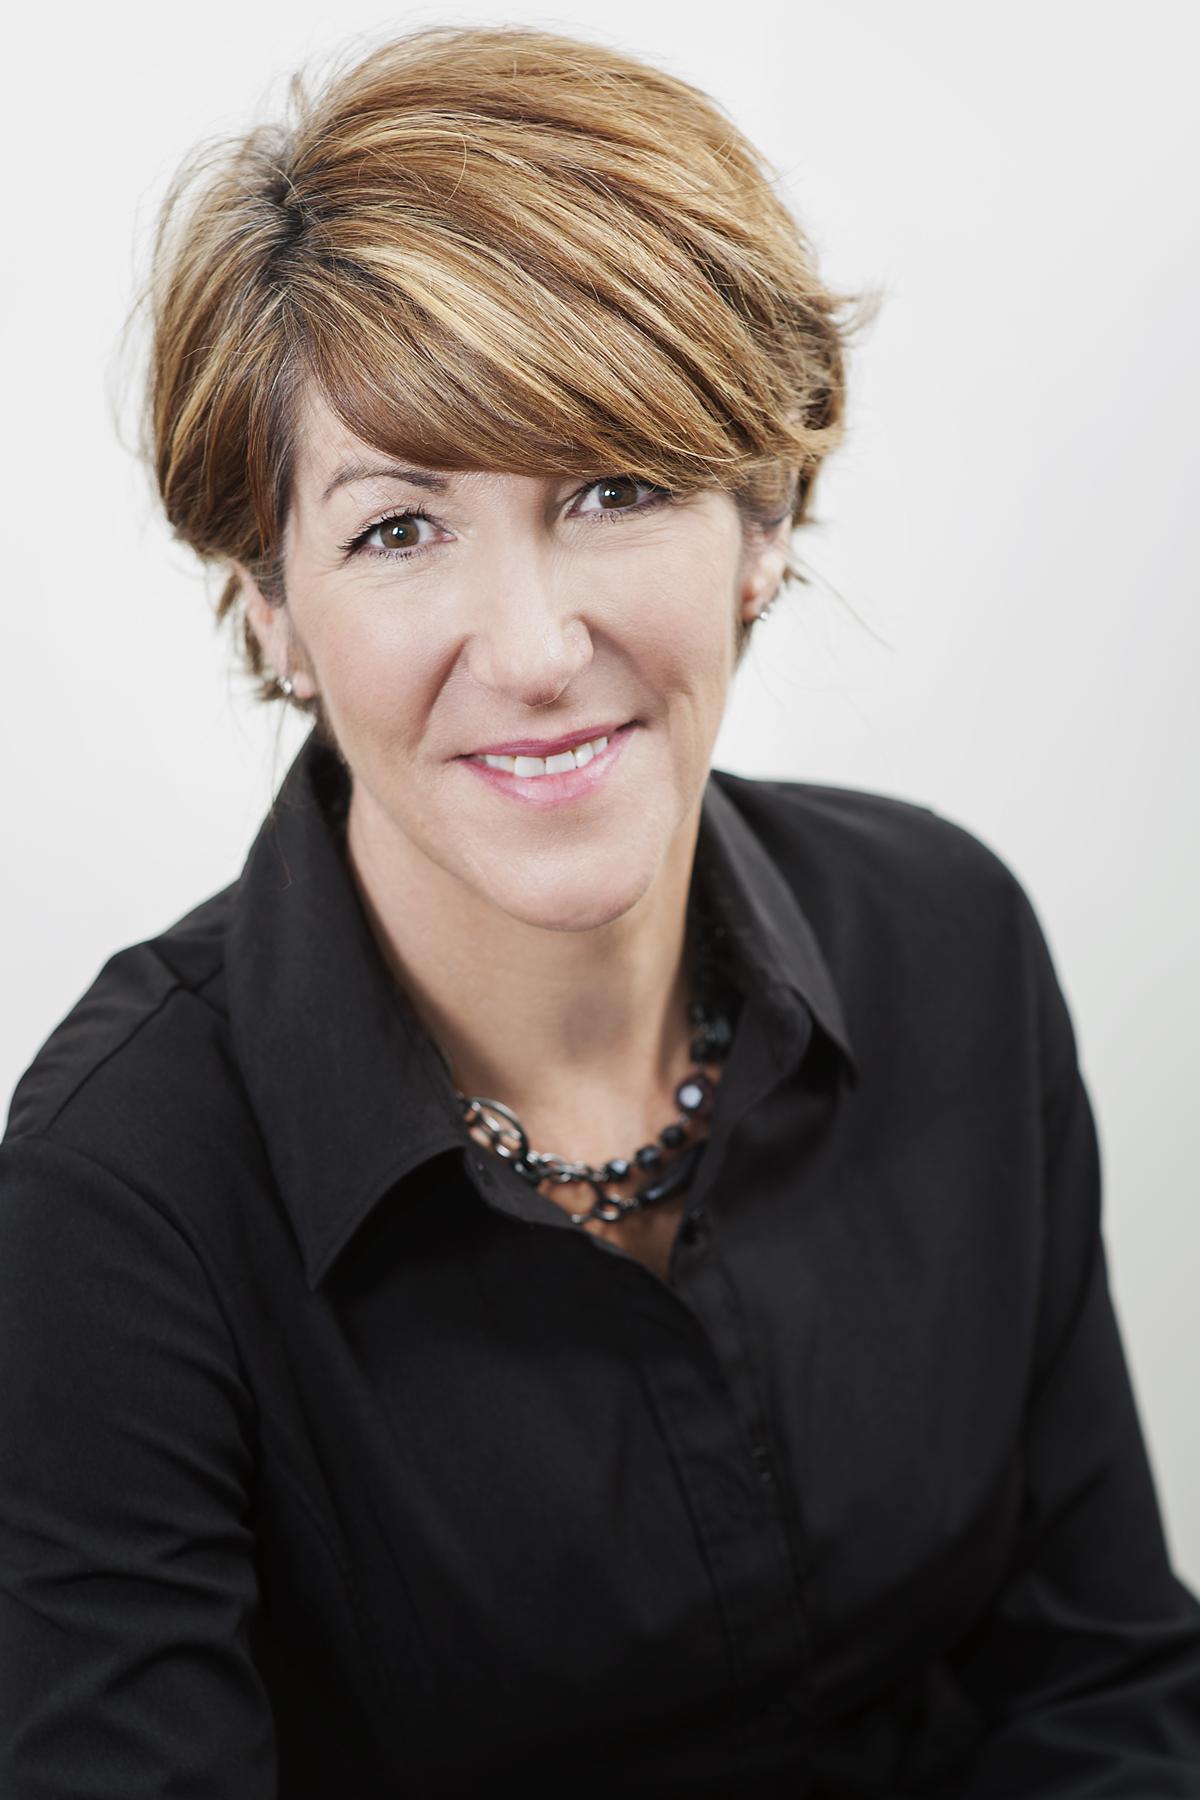 2014 Corporate Portrait, Jacqui Mulikow